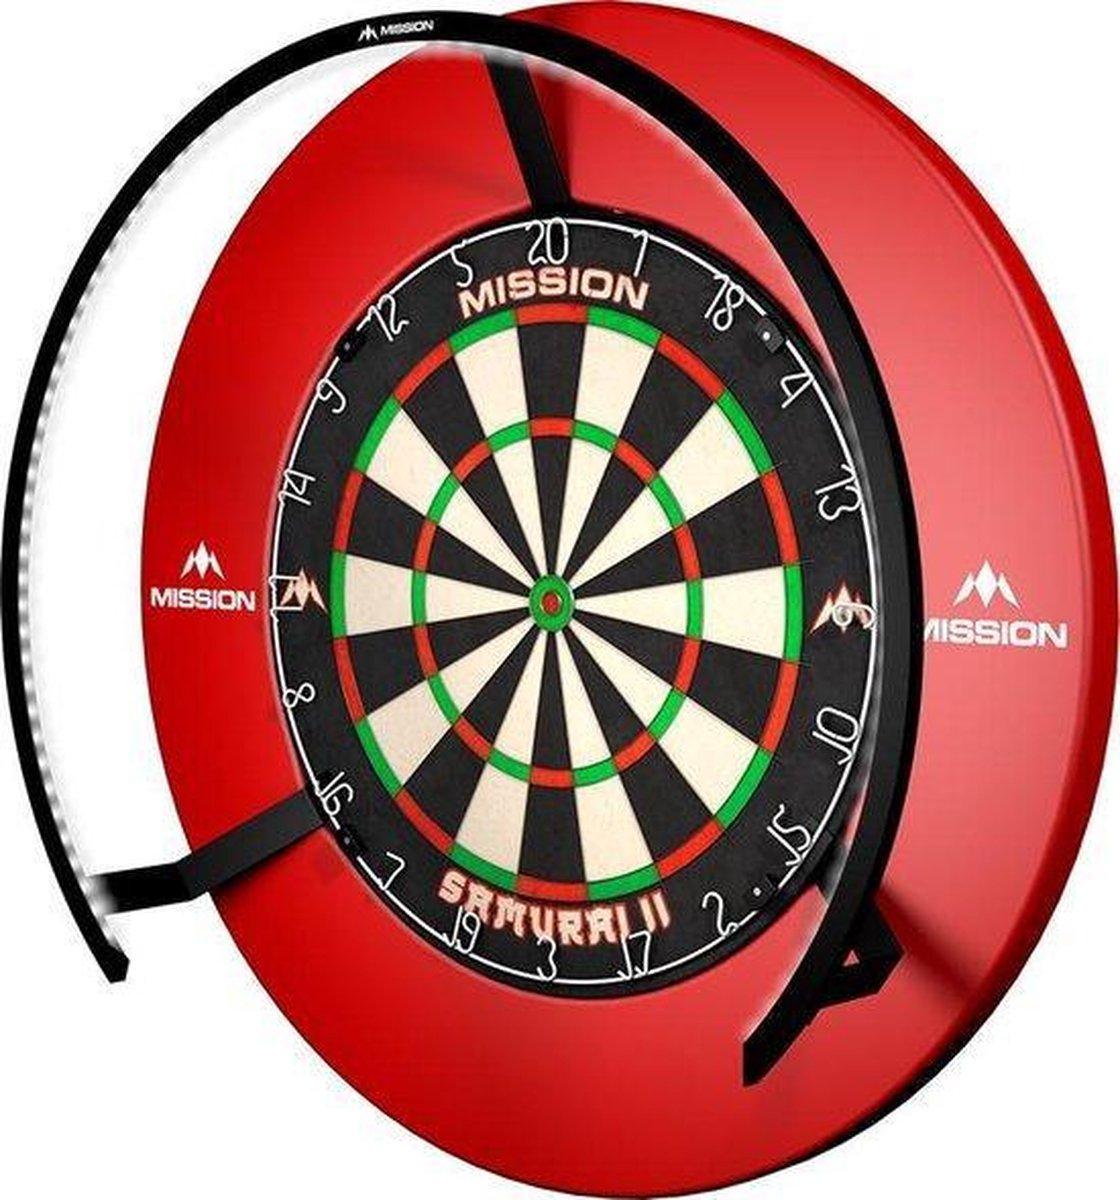 ABC Darts Dartbord Razorblade, Ledverlichting en Rubberen Surround Ring